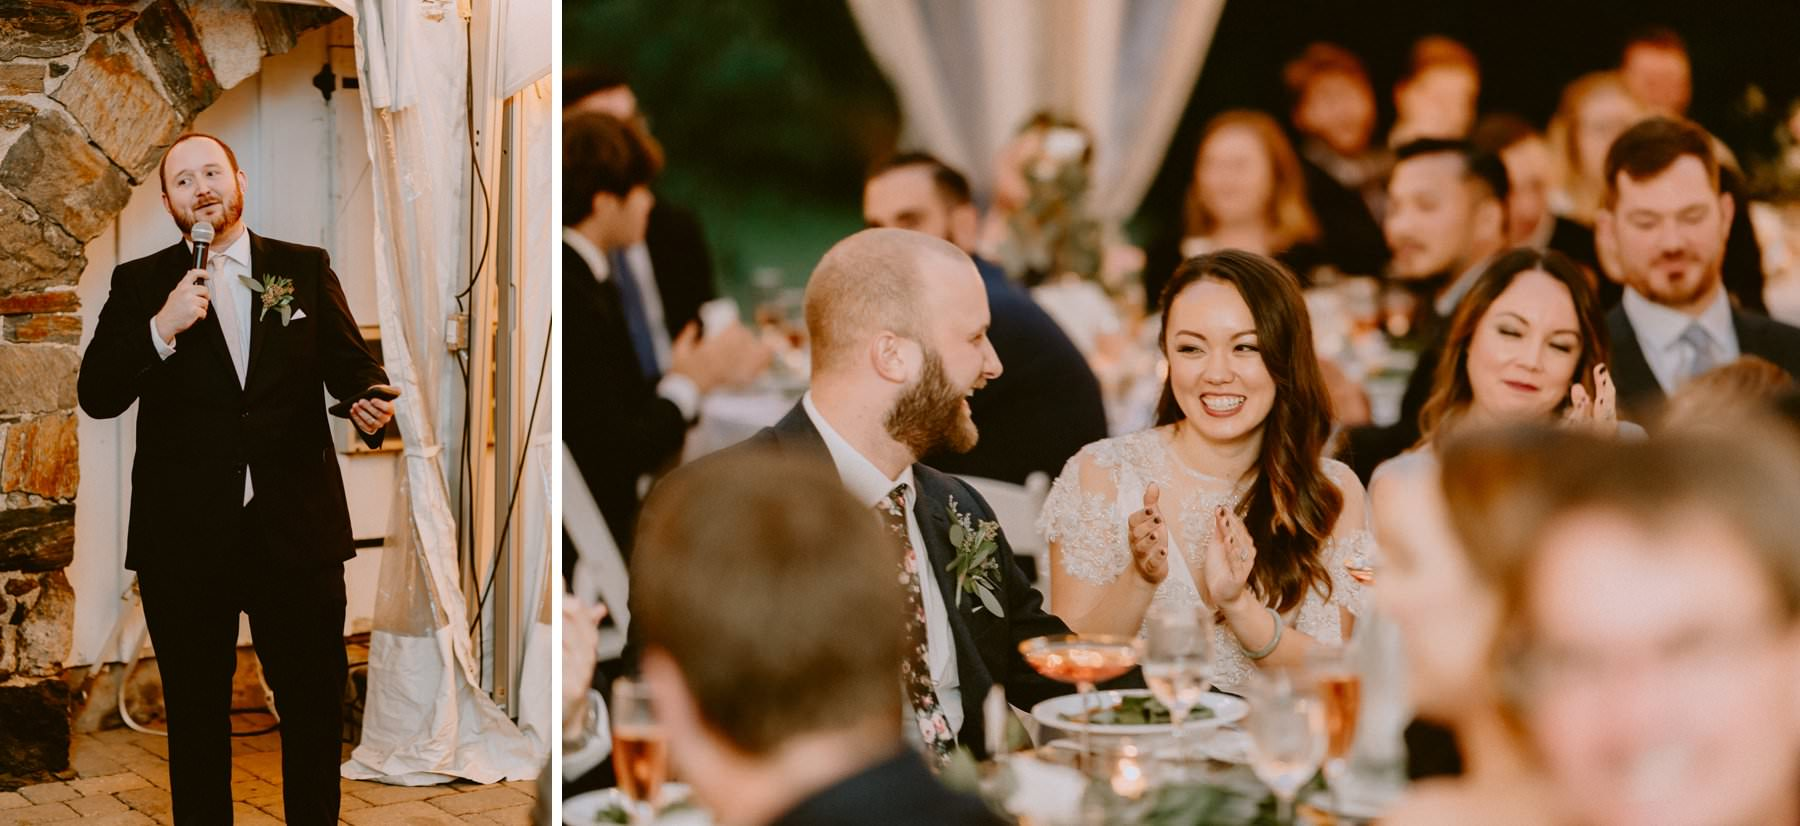 Tyler_arboretum_wedding-086.jpg